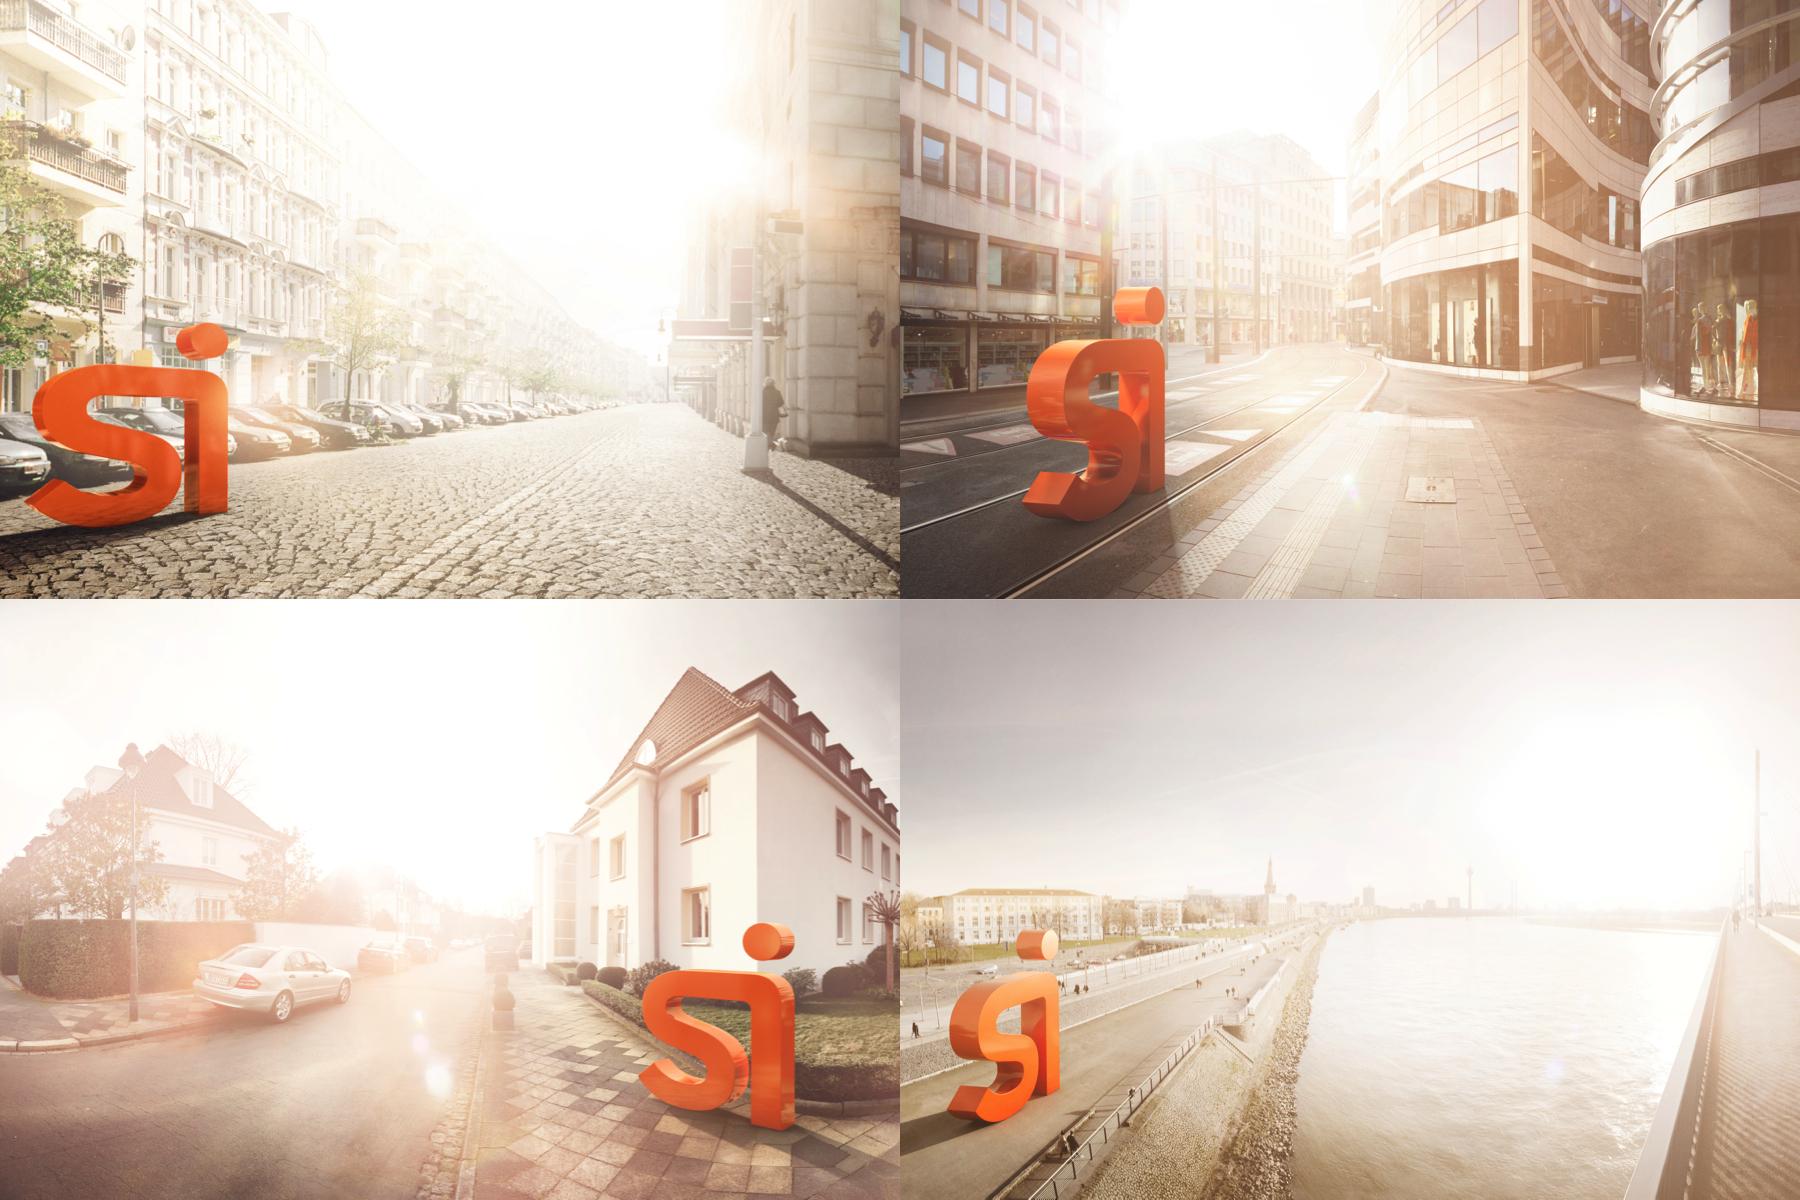 stracke_fotos